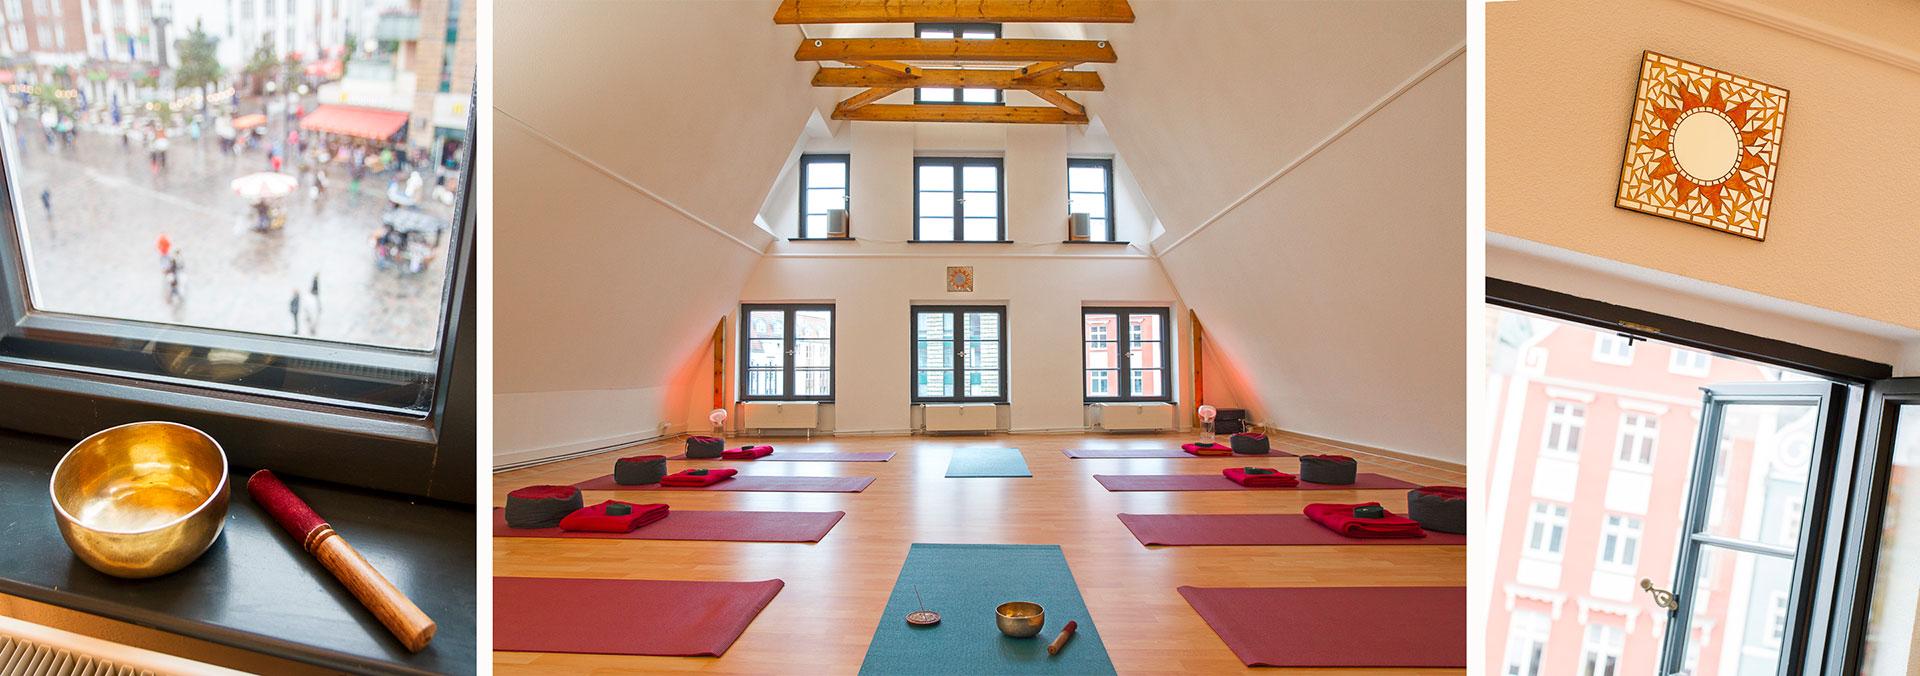 Yogaschule Christian Bender Rostock